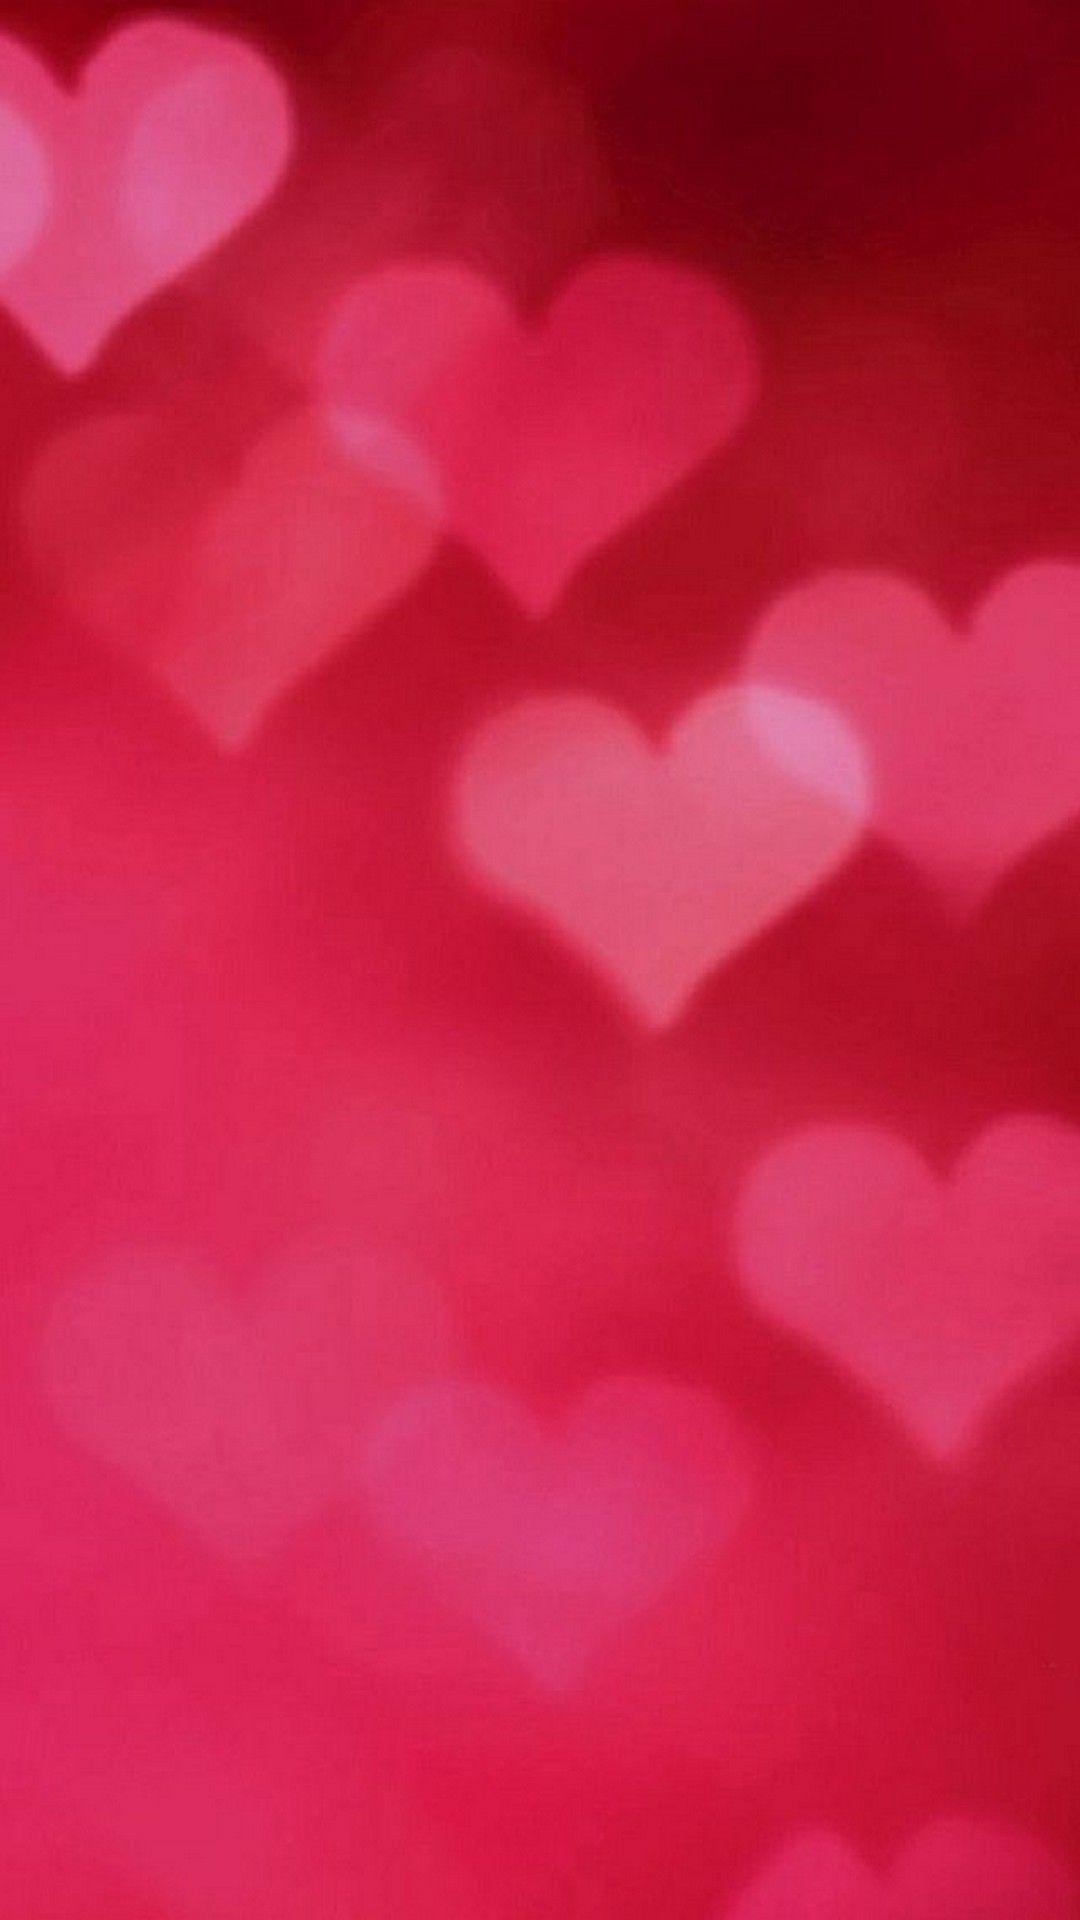 Valentines Day Wallpaper Iphone 6 Best Hd Wallpapers Valentines Wallpaper Valentines Wallpaper Iphone Iphone Wallpaper Vintage